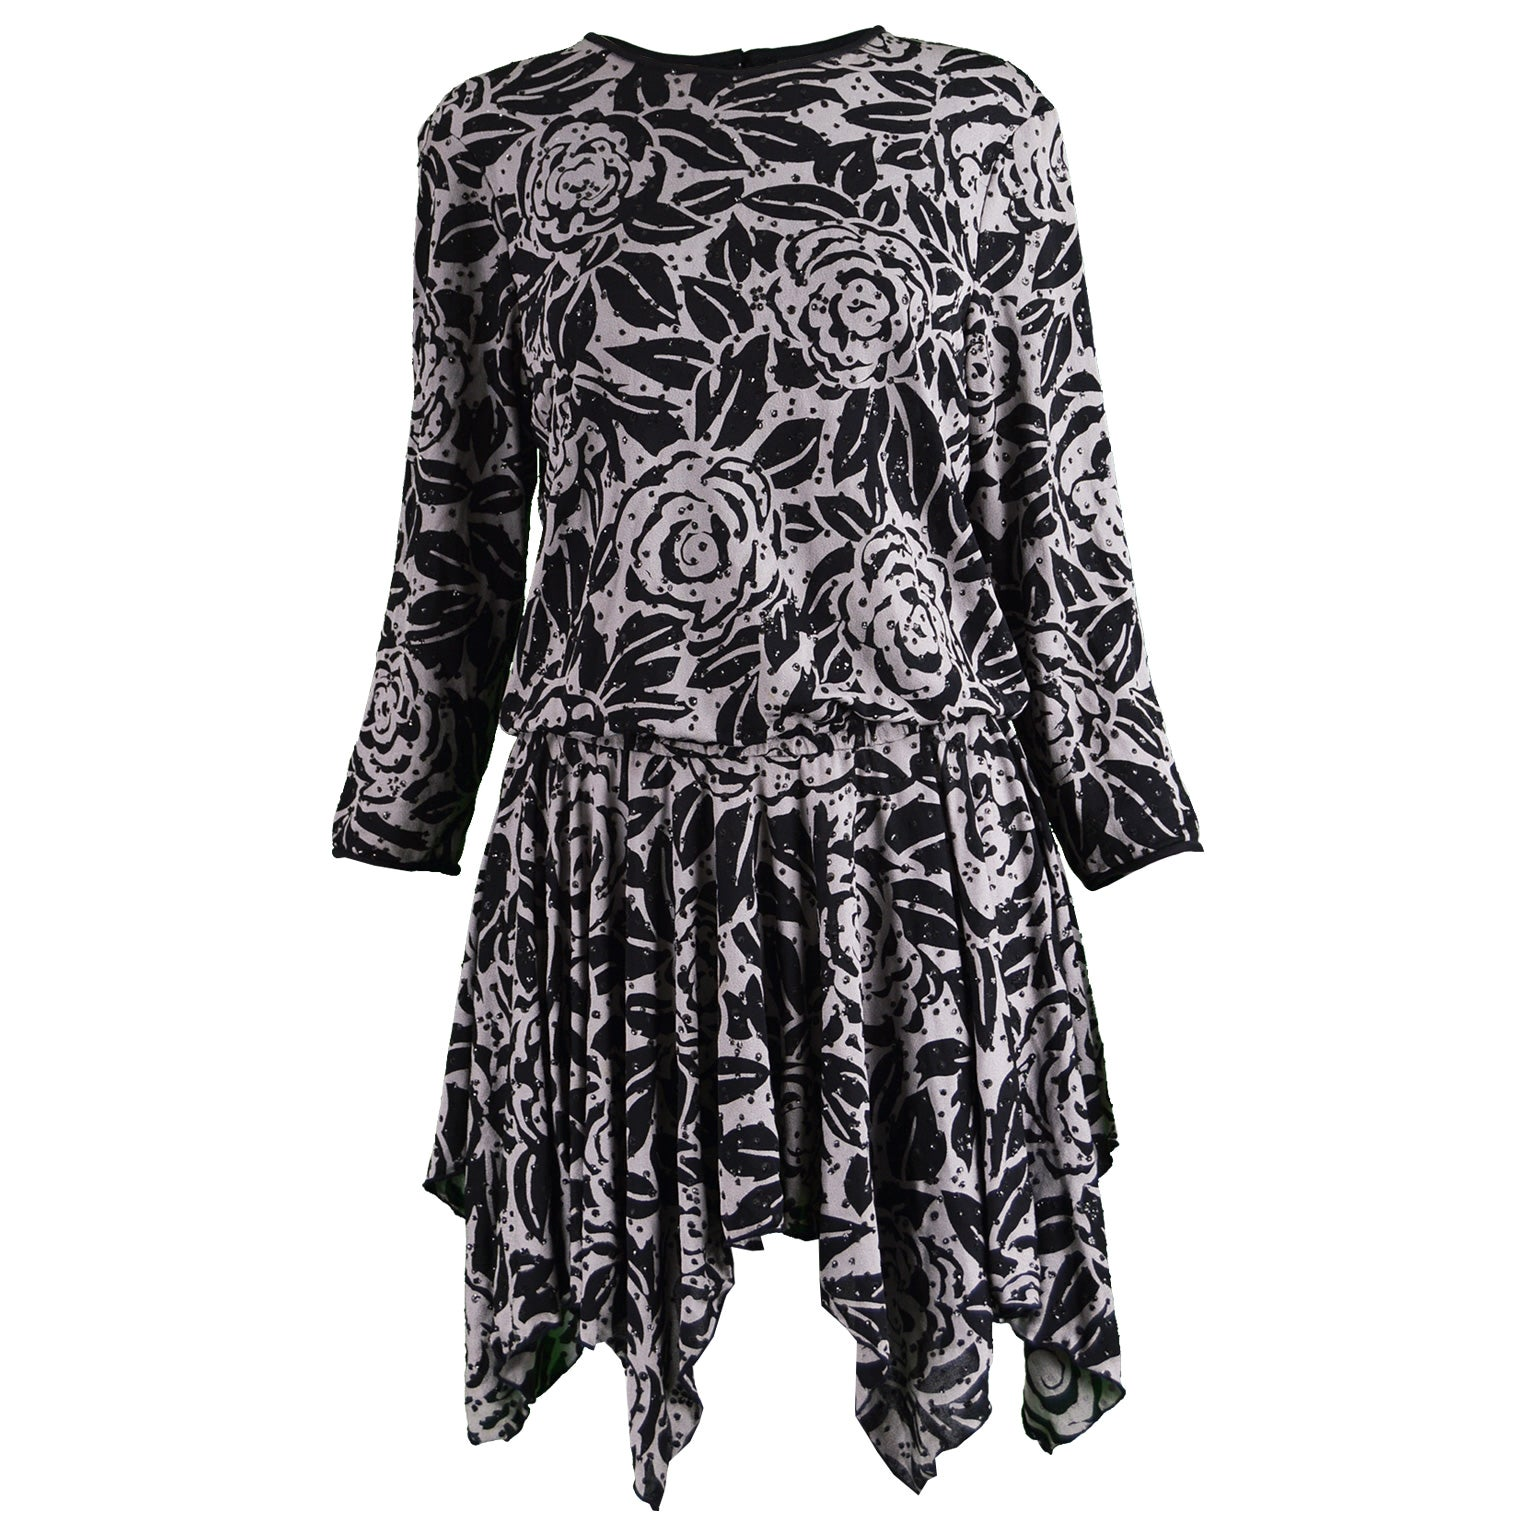 Terence Nolder Silk & Sequins Grey Black Handkerchief Vintage Party Tunic Dress